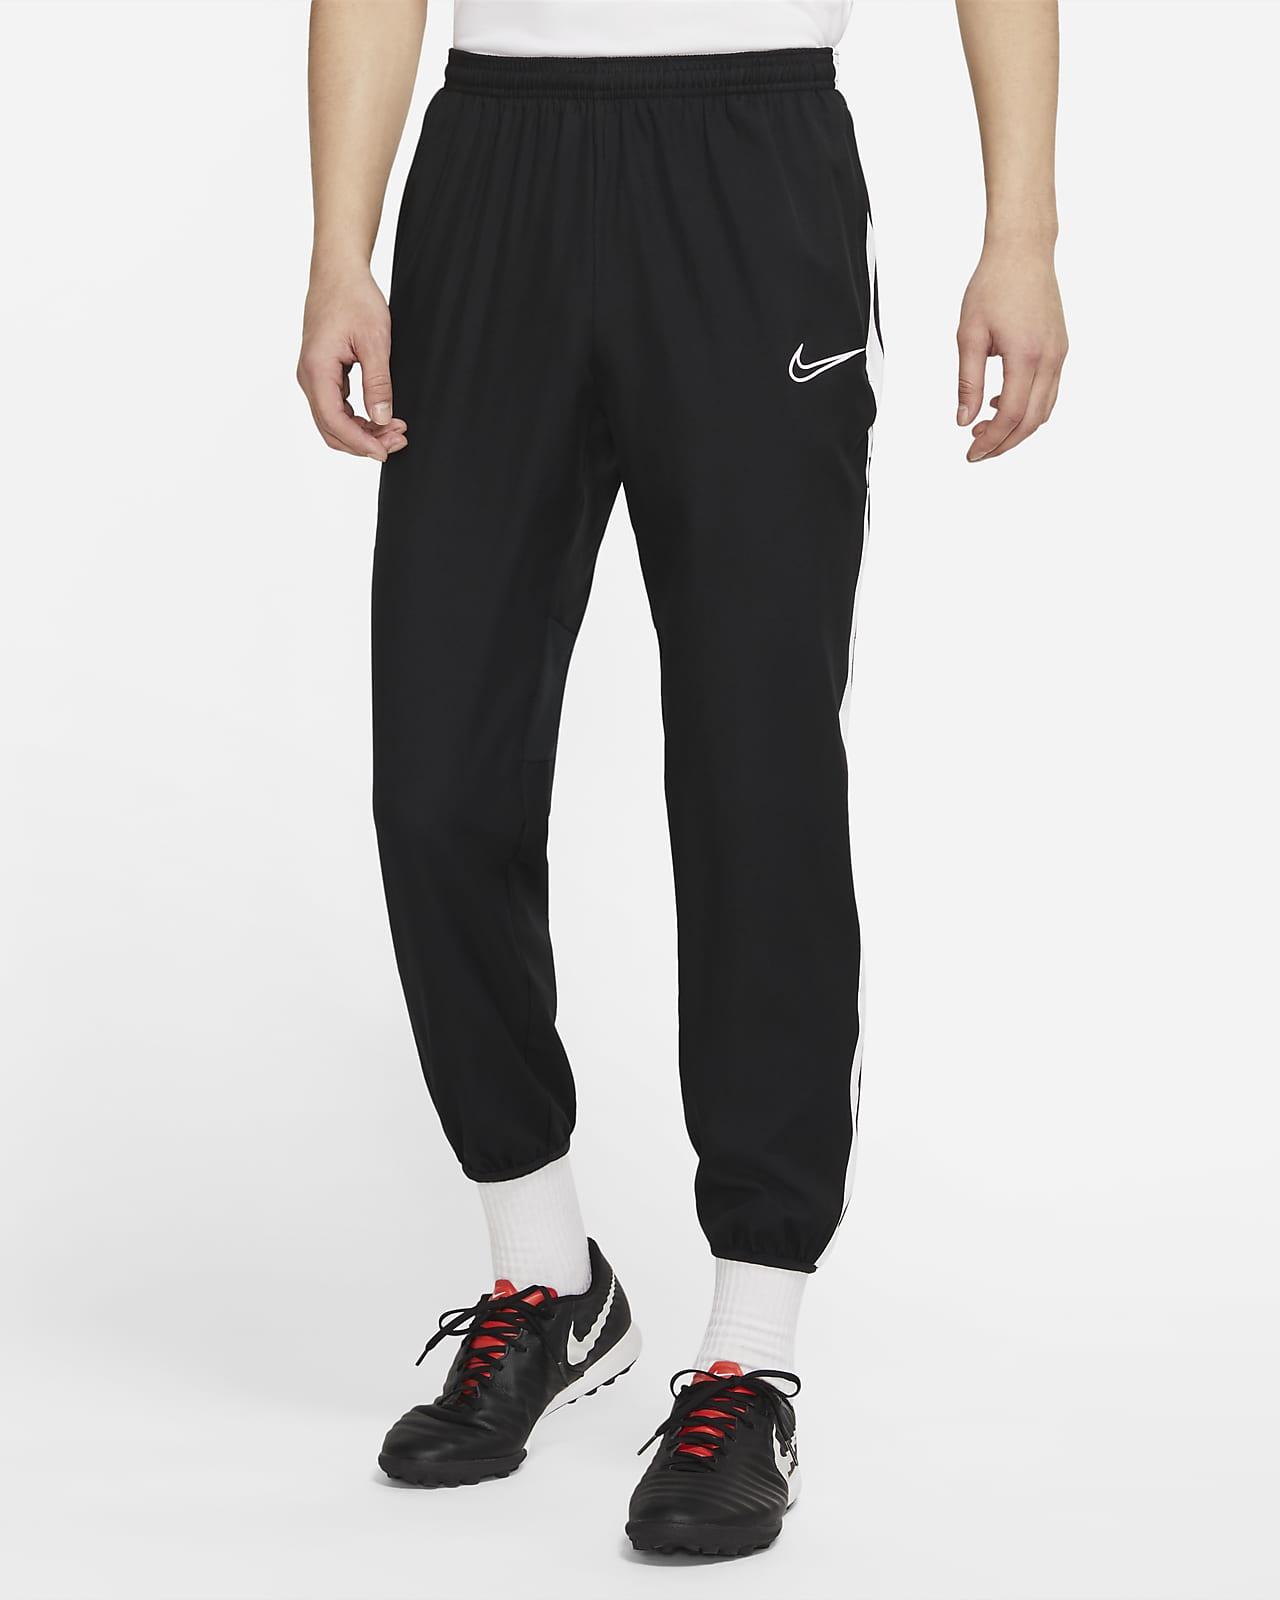 Nike Dri-FIT Academy Men's Adjustable Woven Football Pants